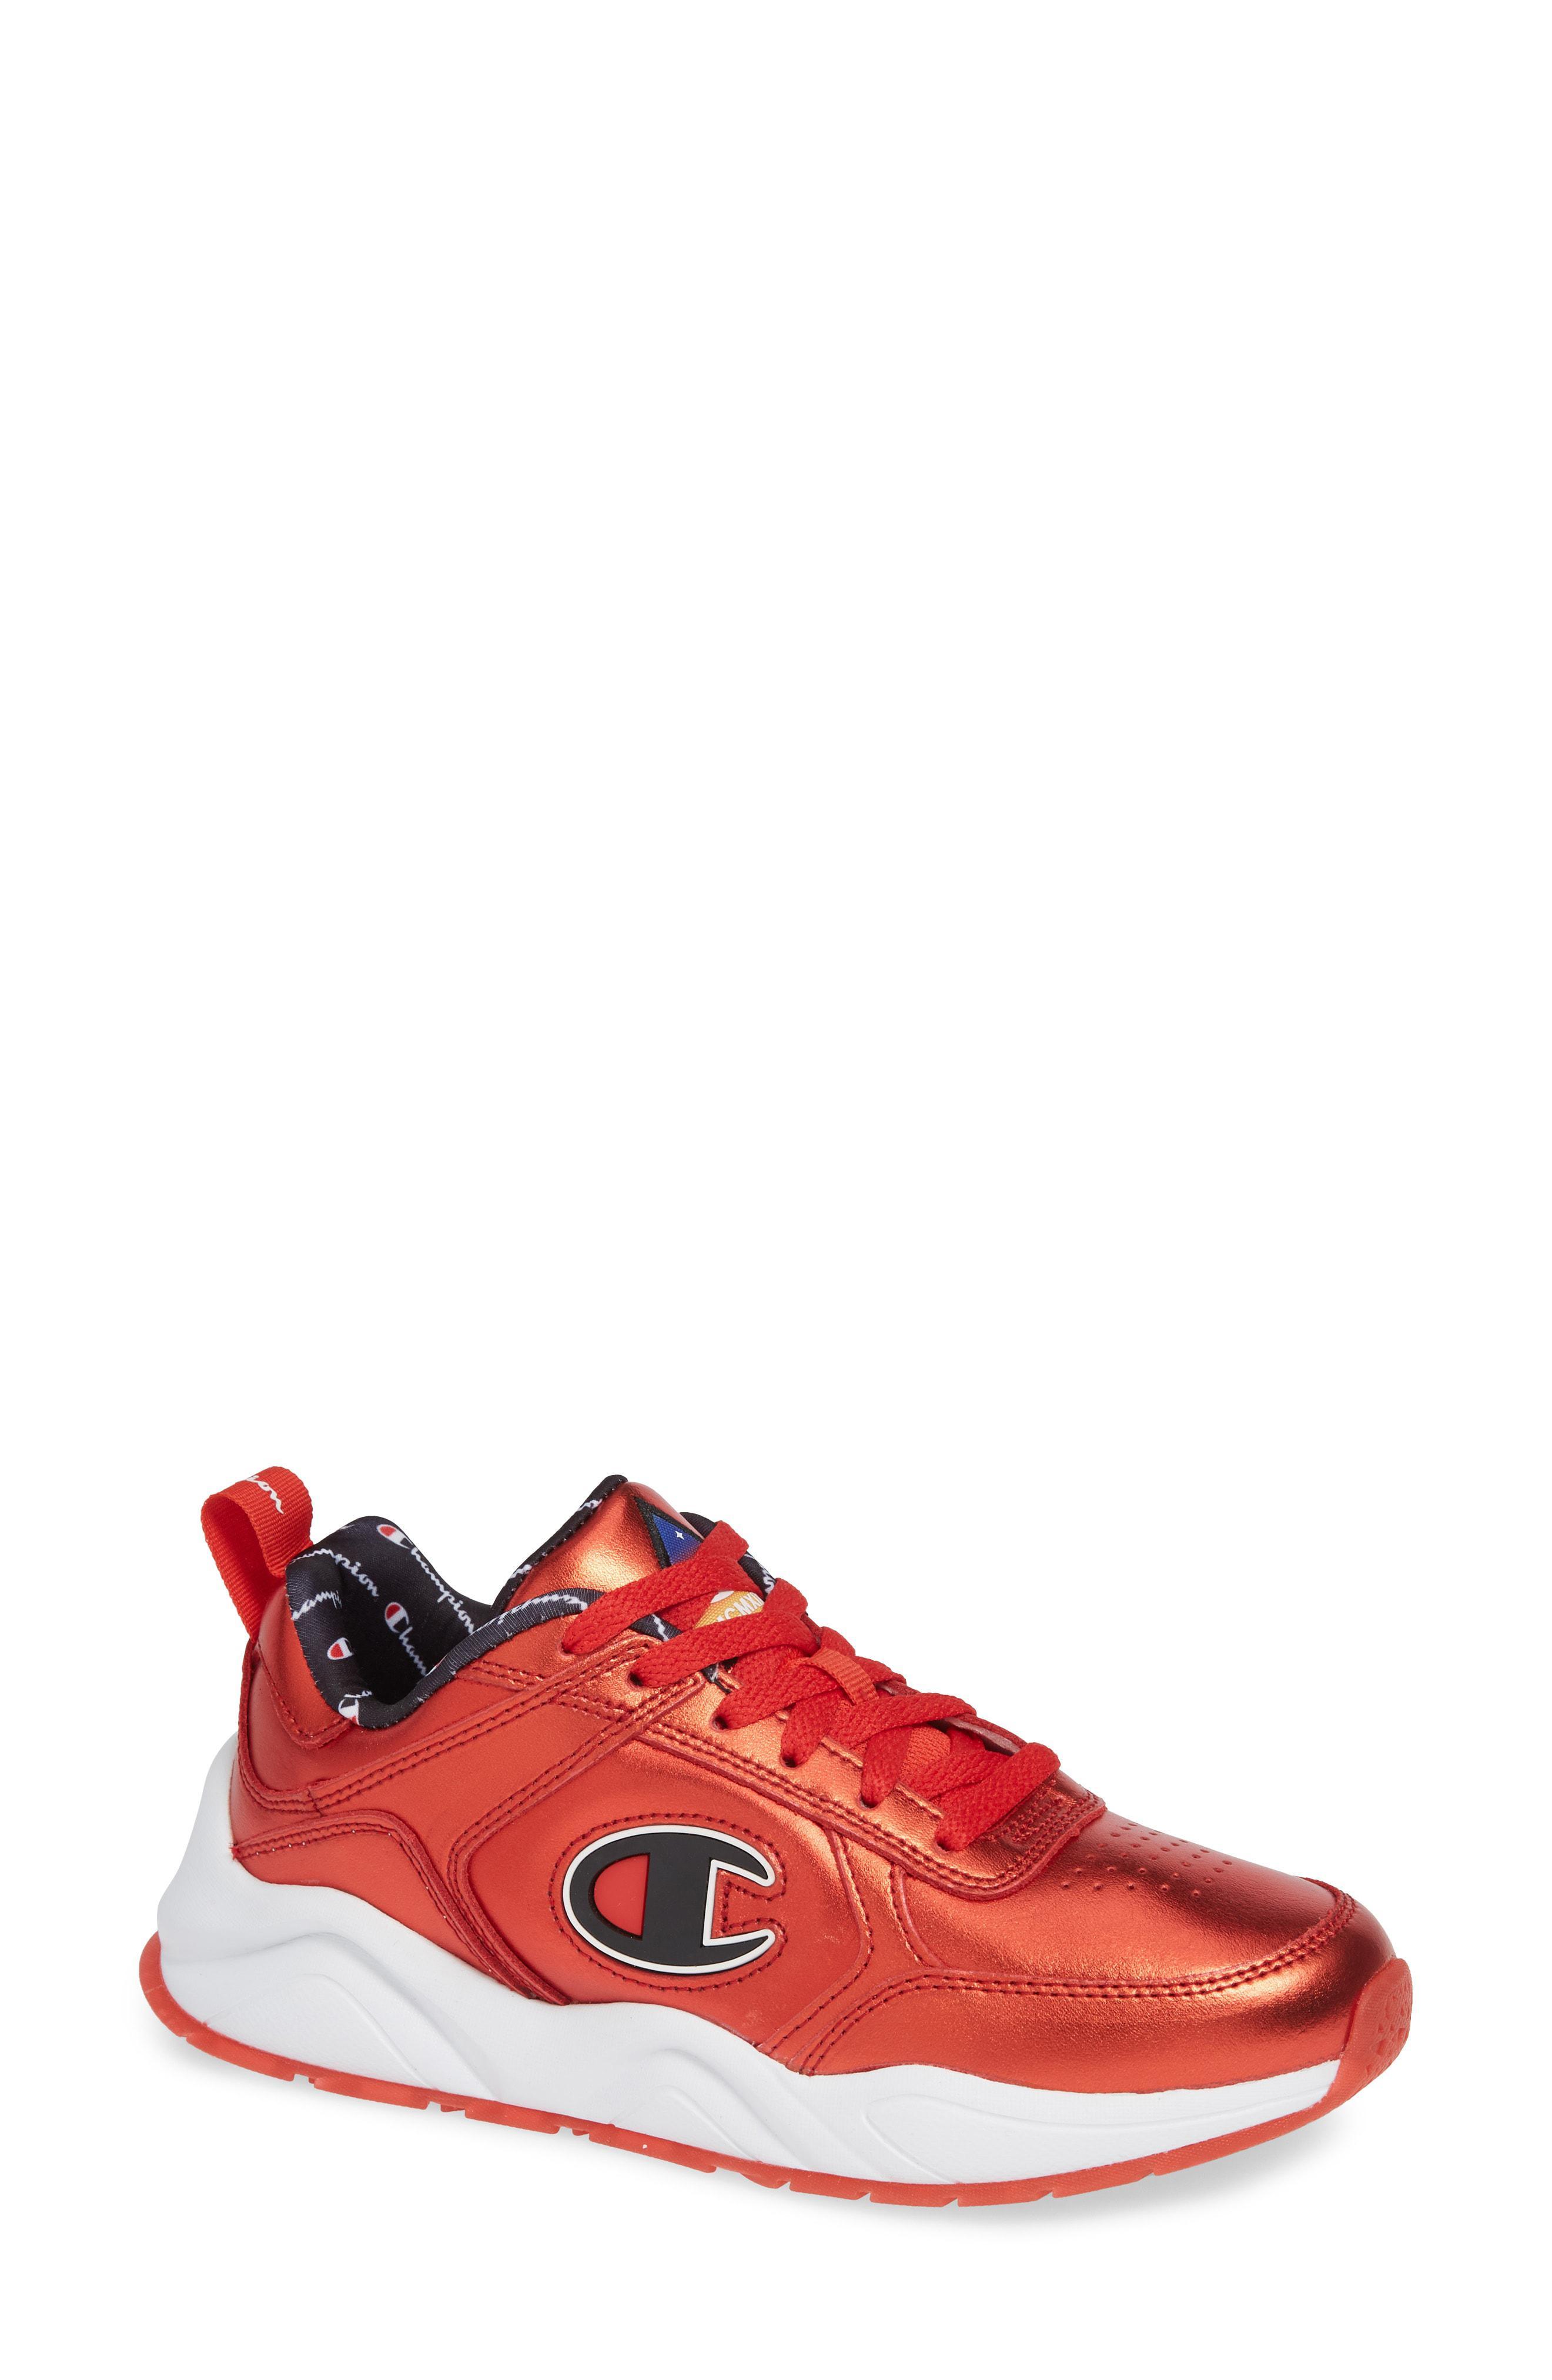 3b5ca0d925d Lyst - Champion 93 Eighteen Metallic Sneaker in Red